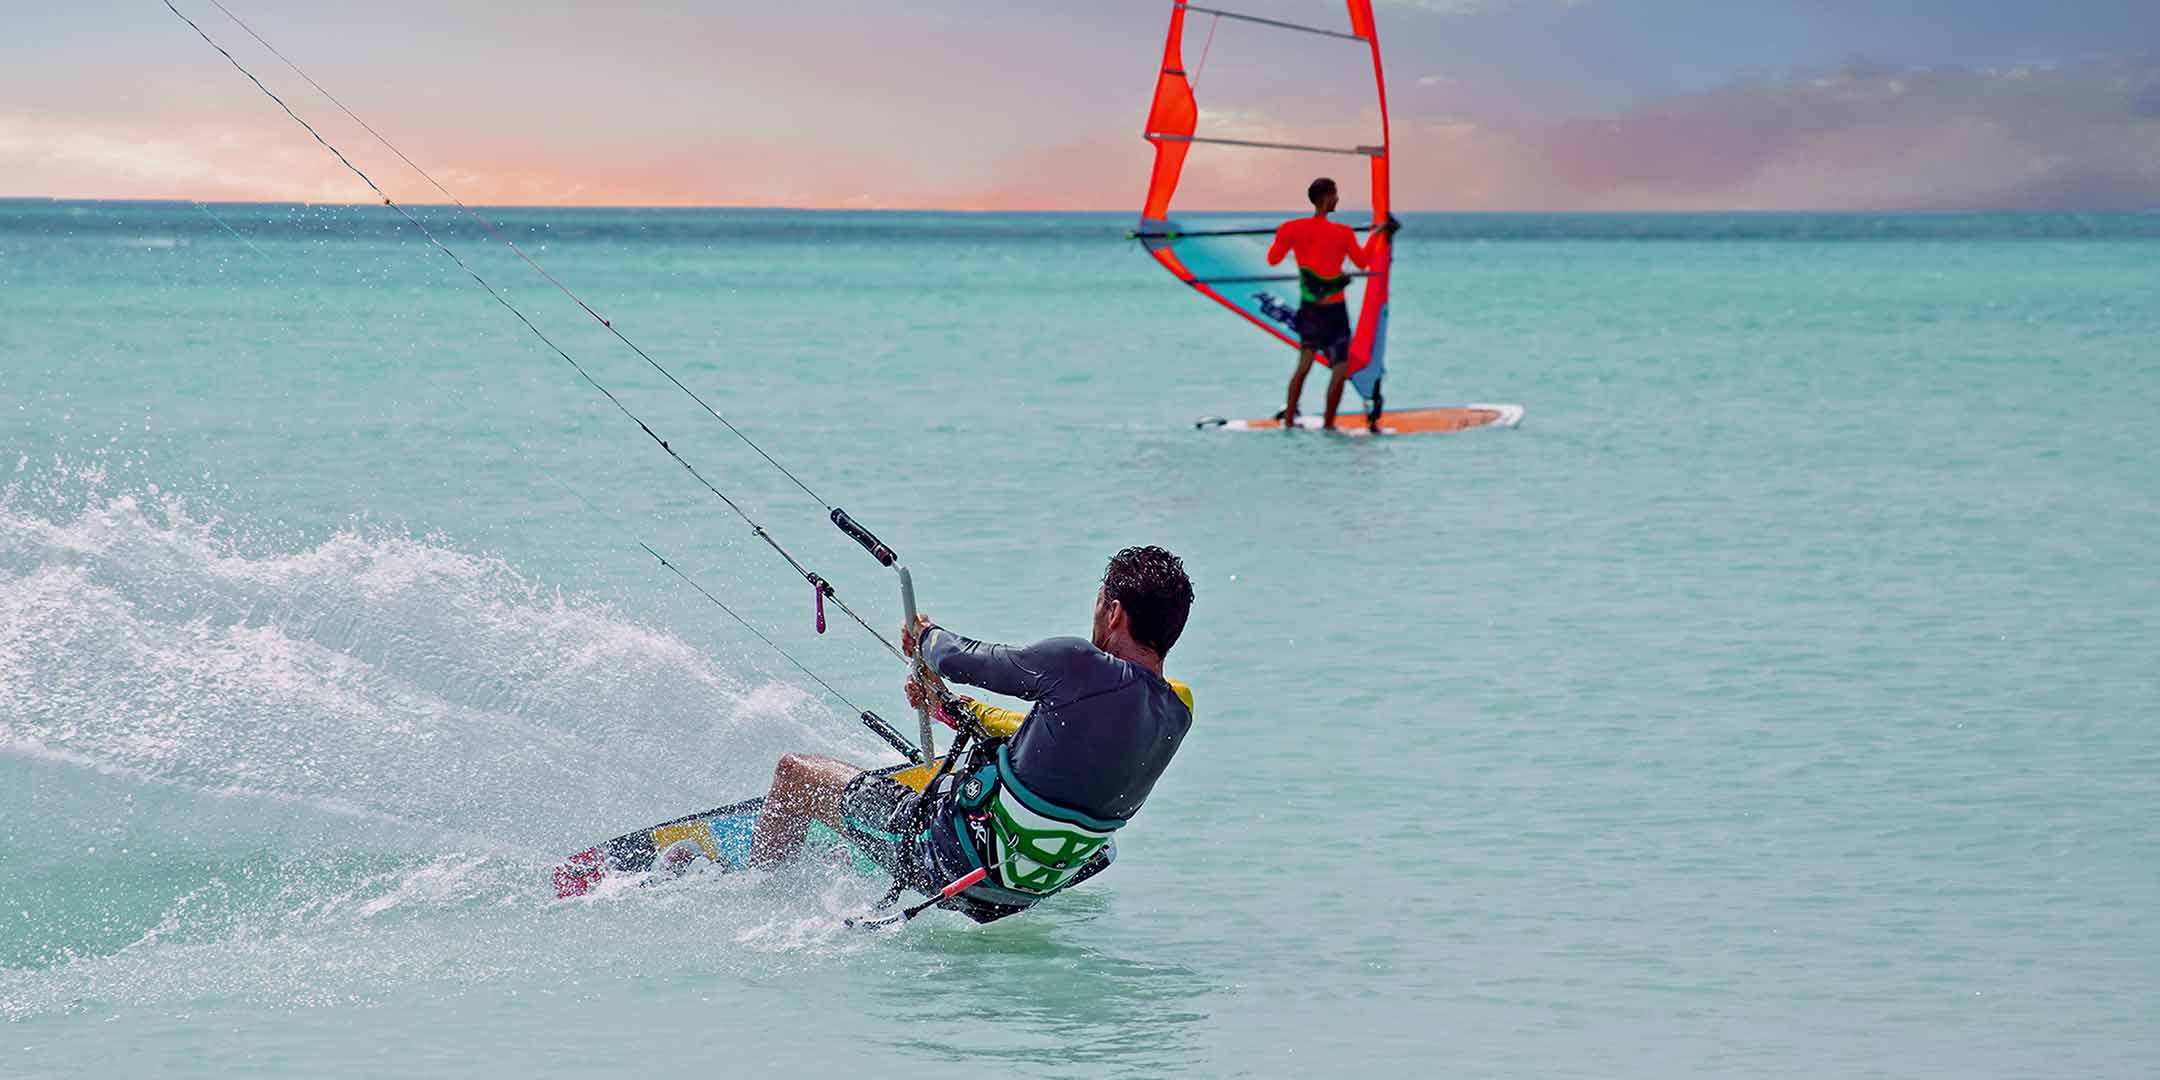 WindSurfing-Image-Rectangle-2160x1080